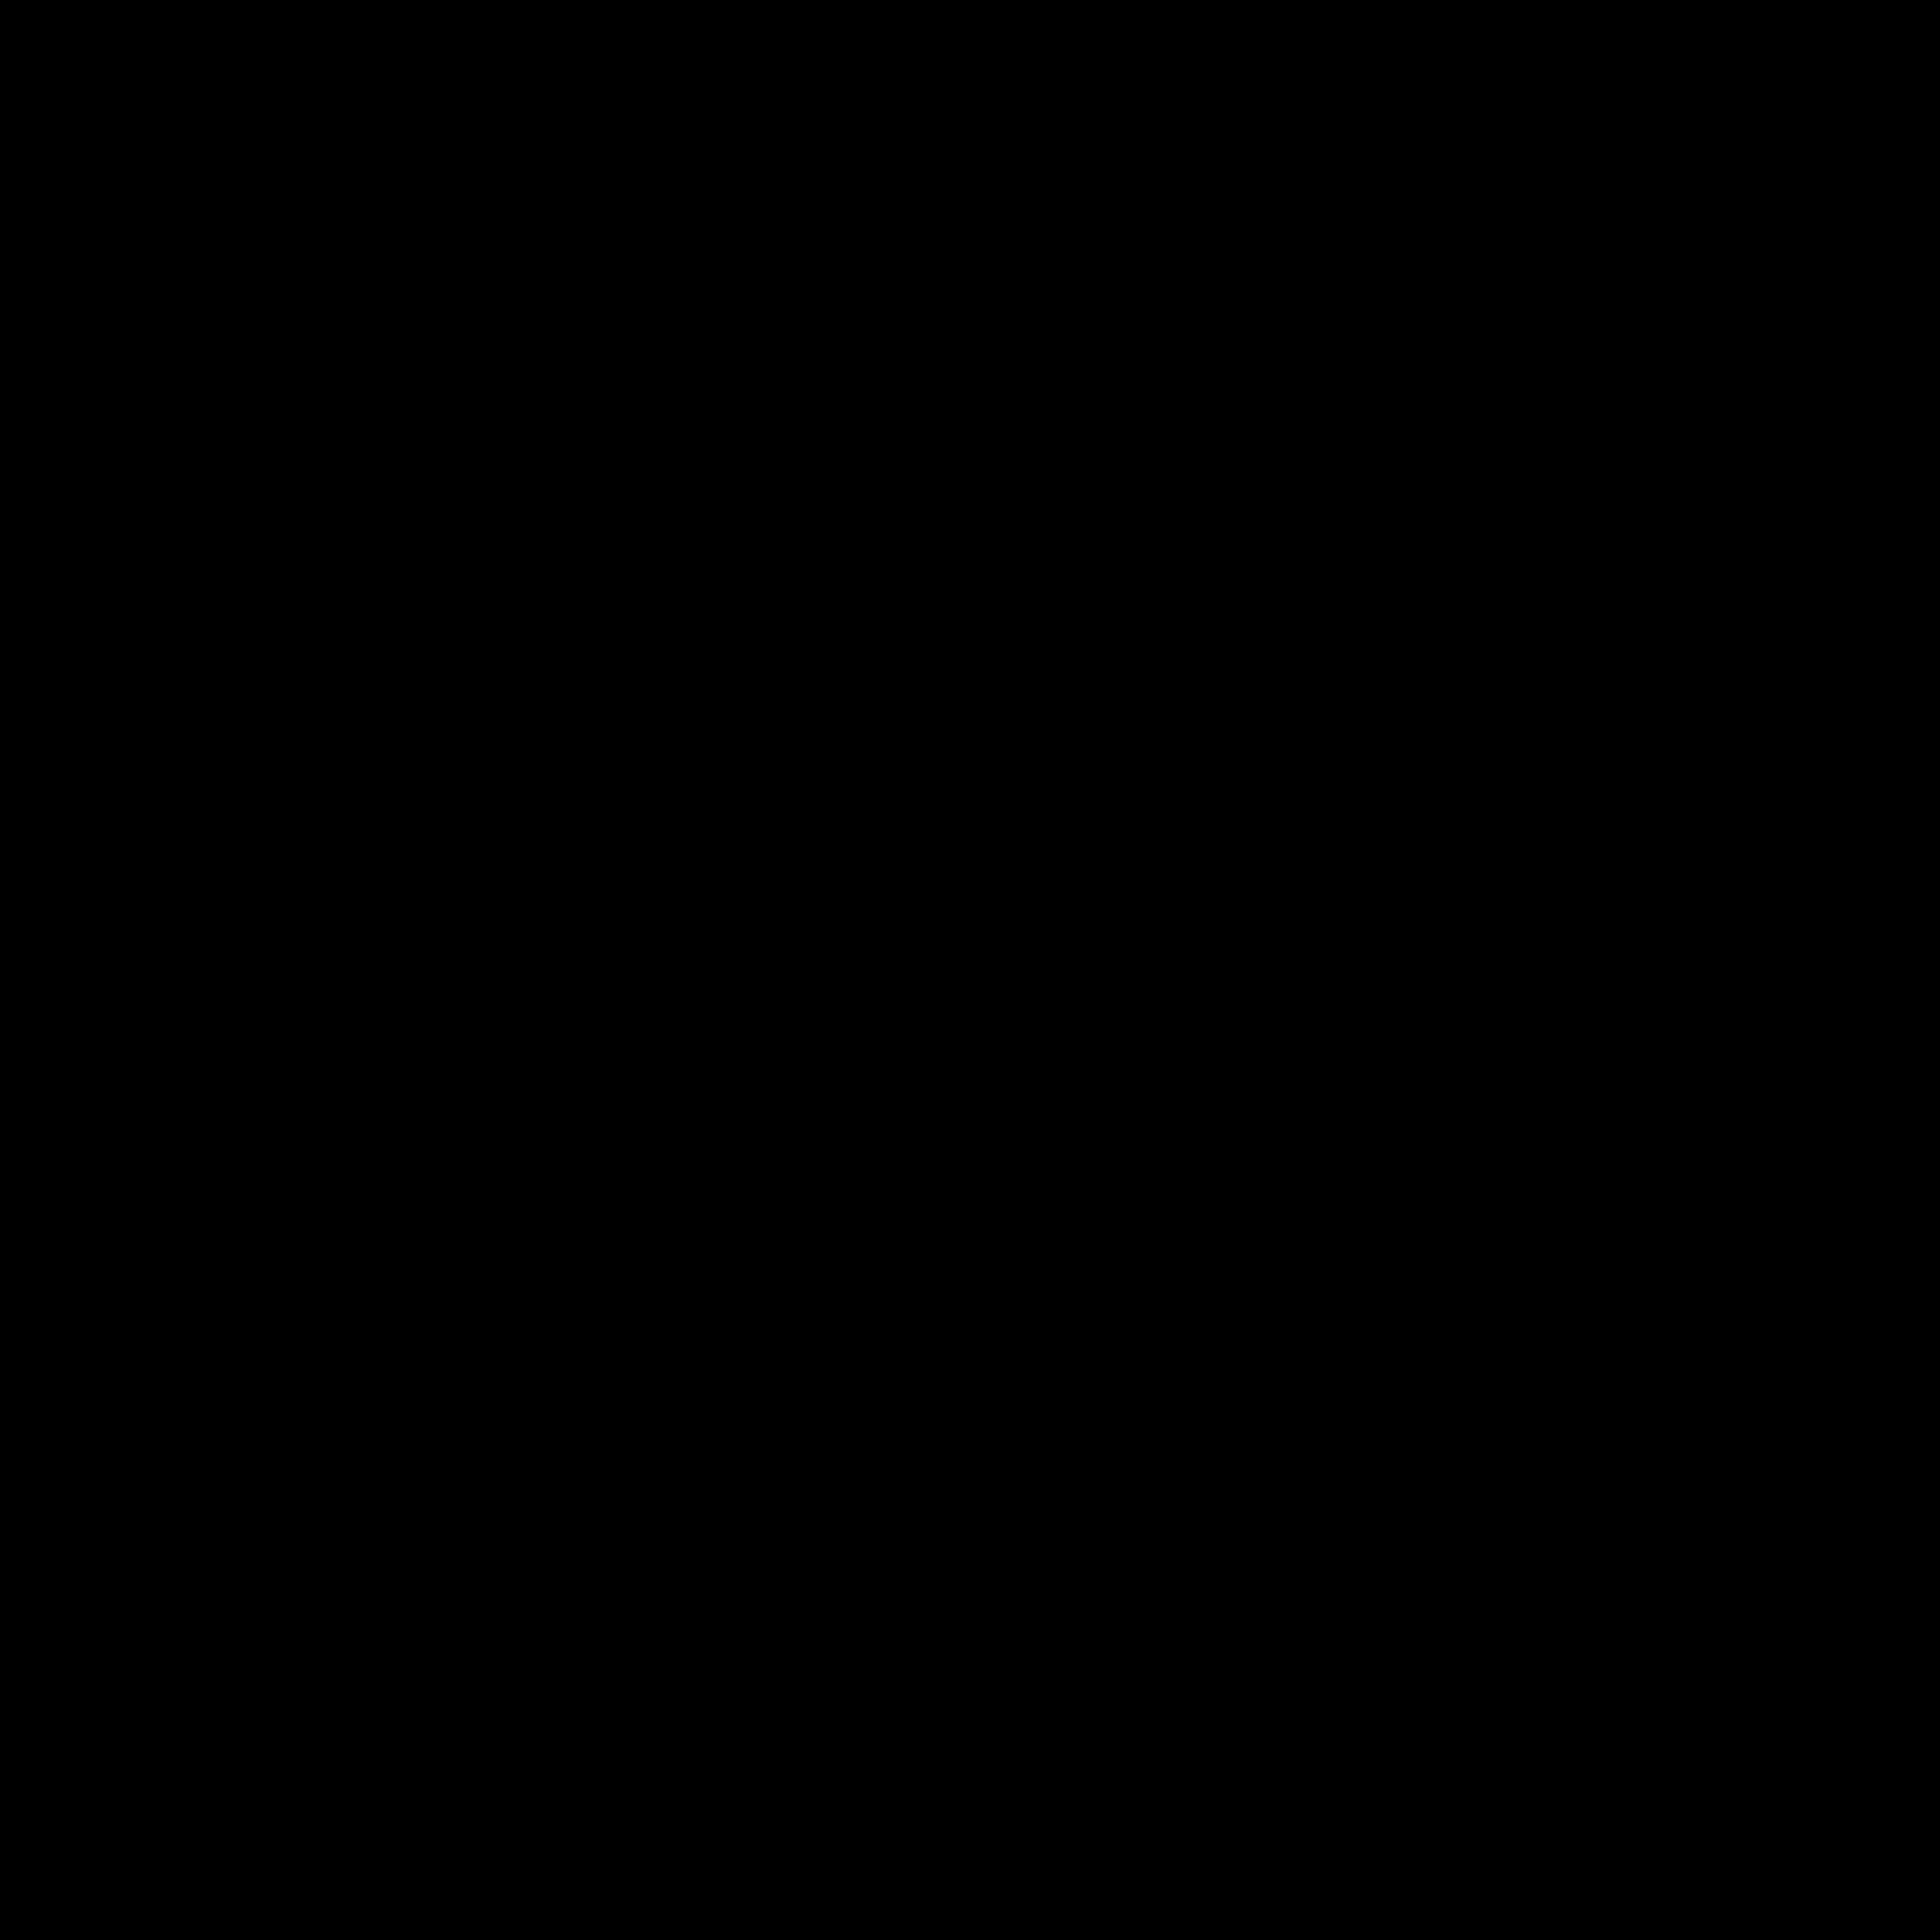 Index Of Awmcmapdatasymbols